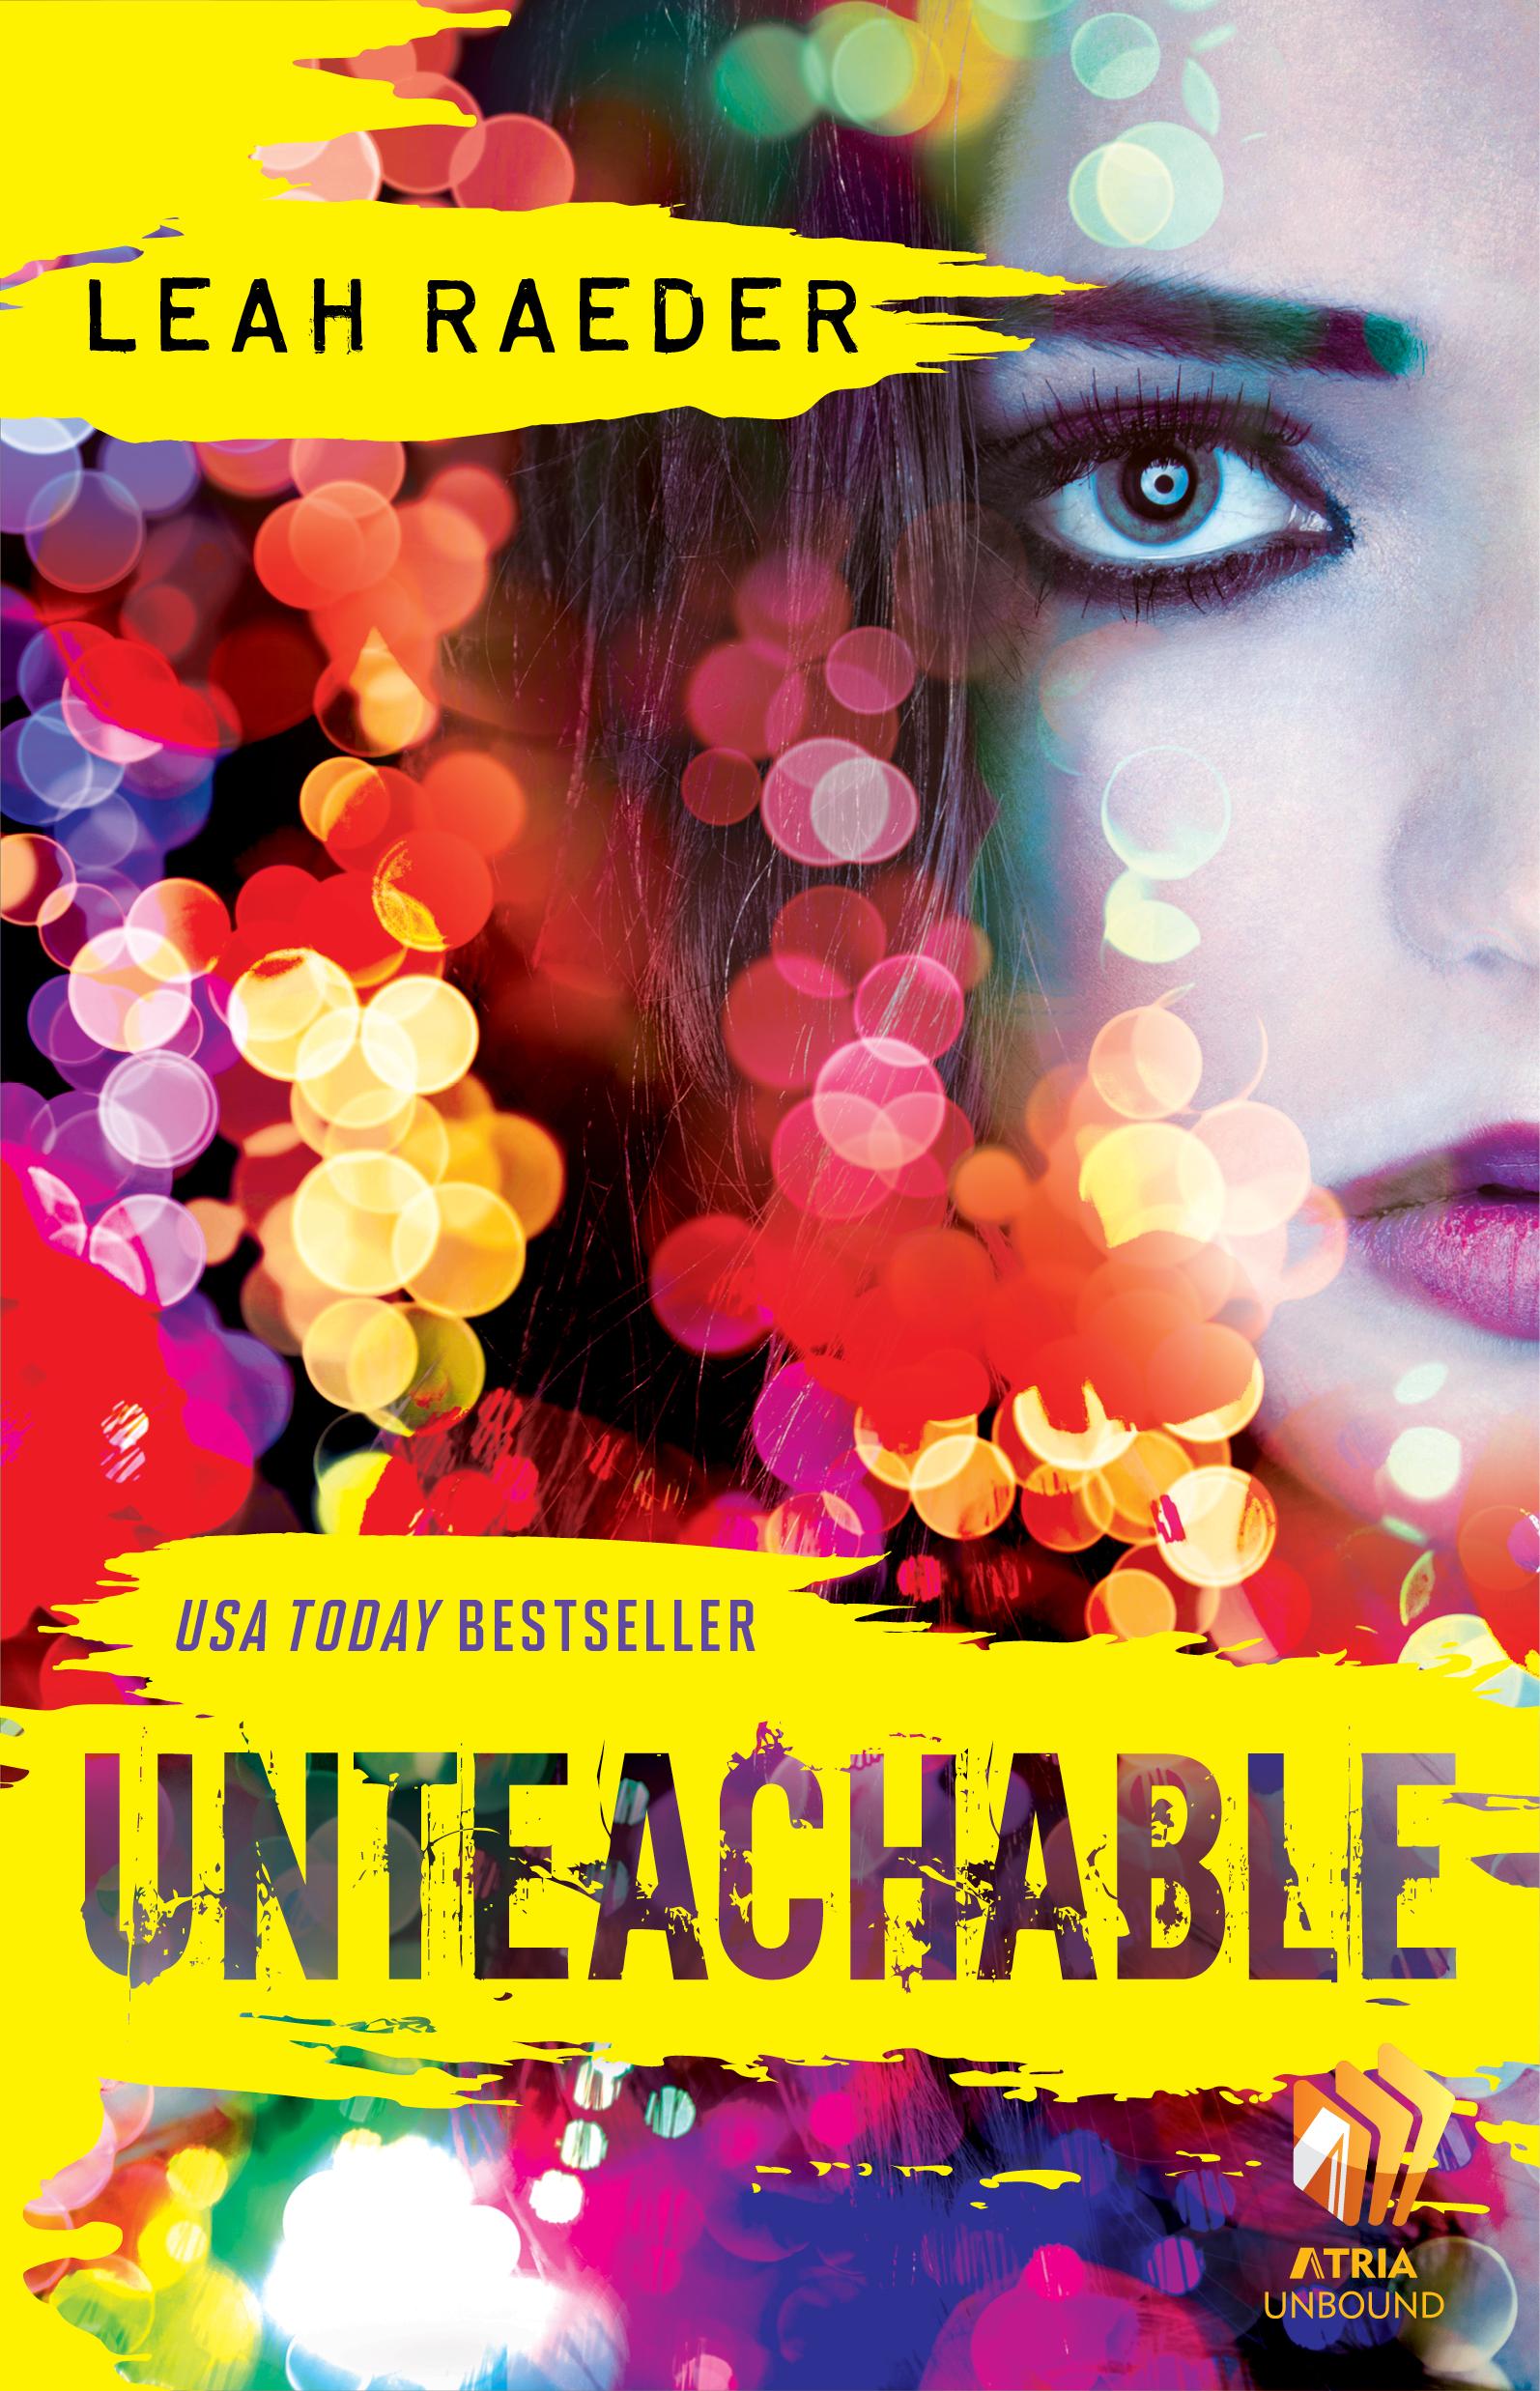 Unteachable Leah Raeder